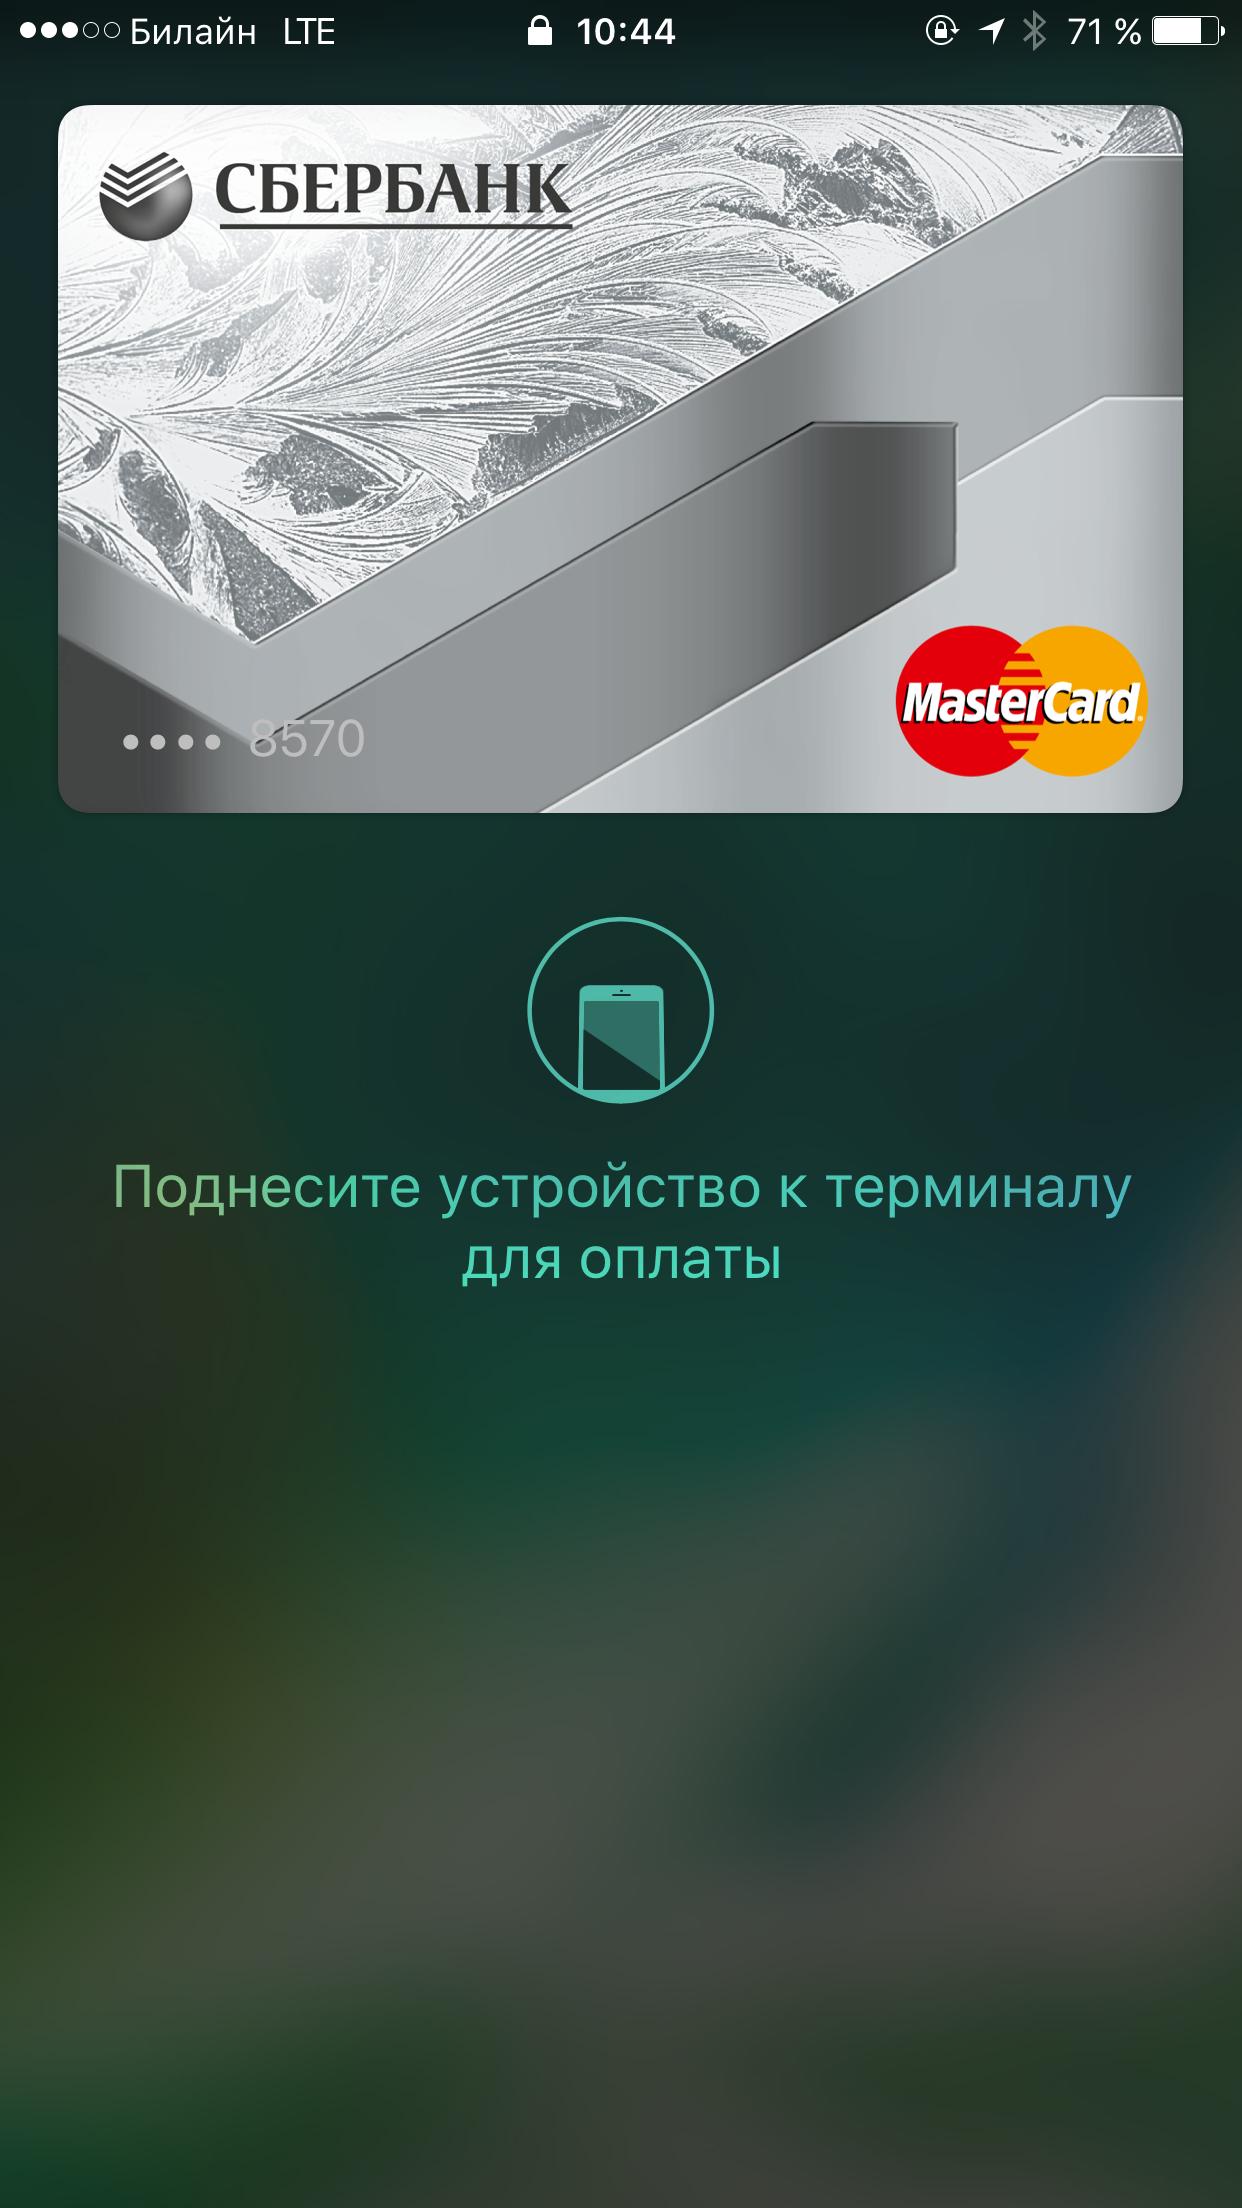 кредитная карта халва отзывы aliexpress